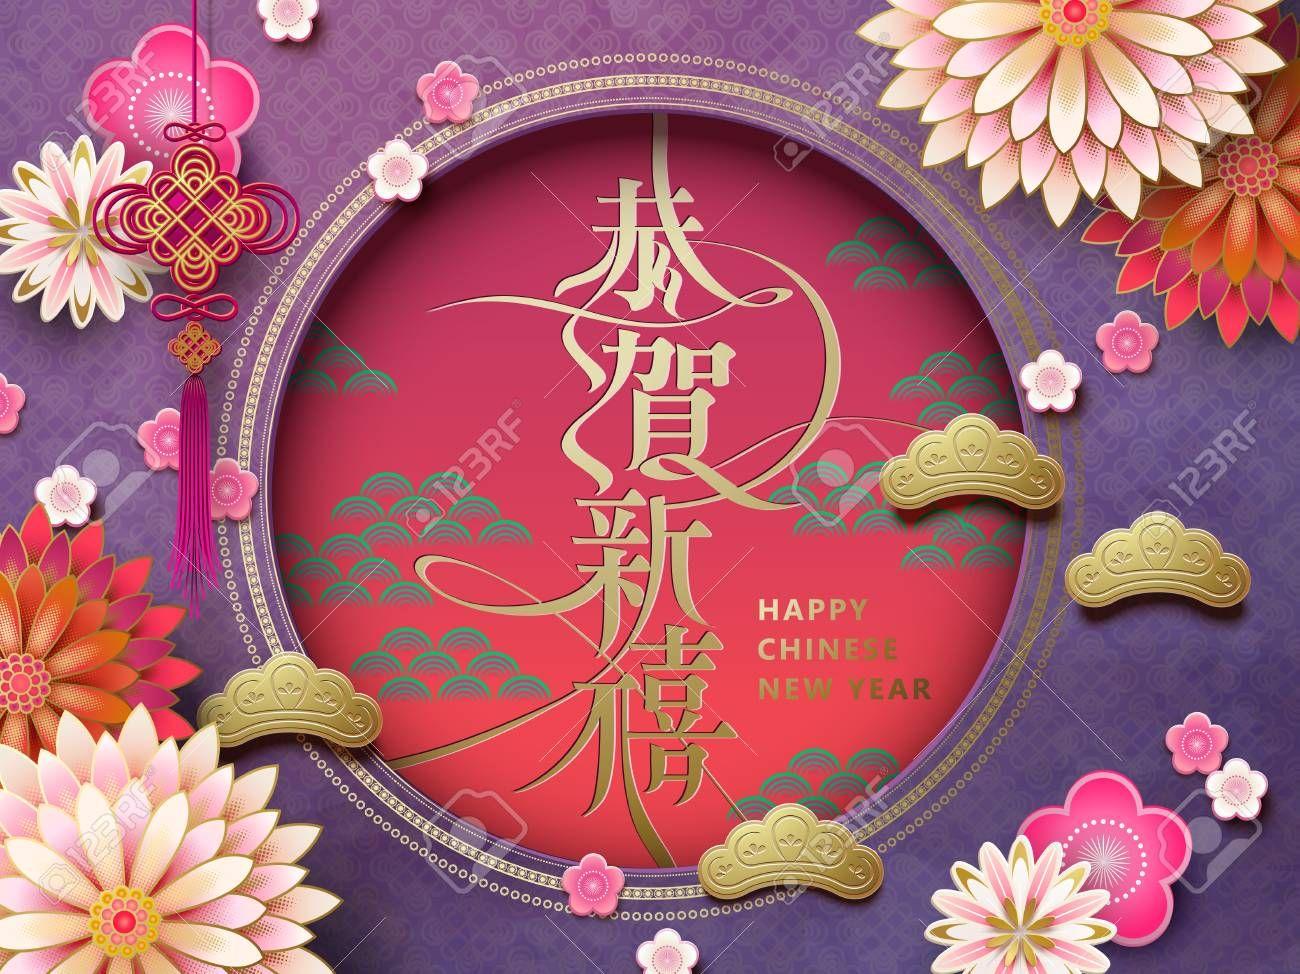 Chinese new year design with chrysanthemum and plum